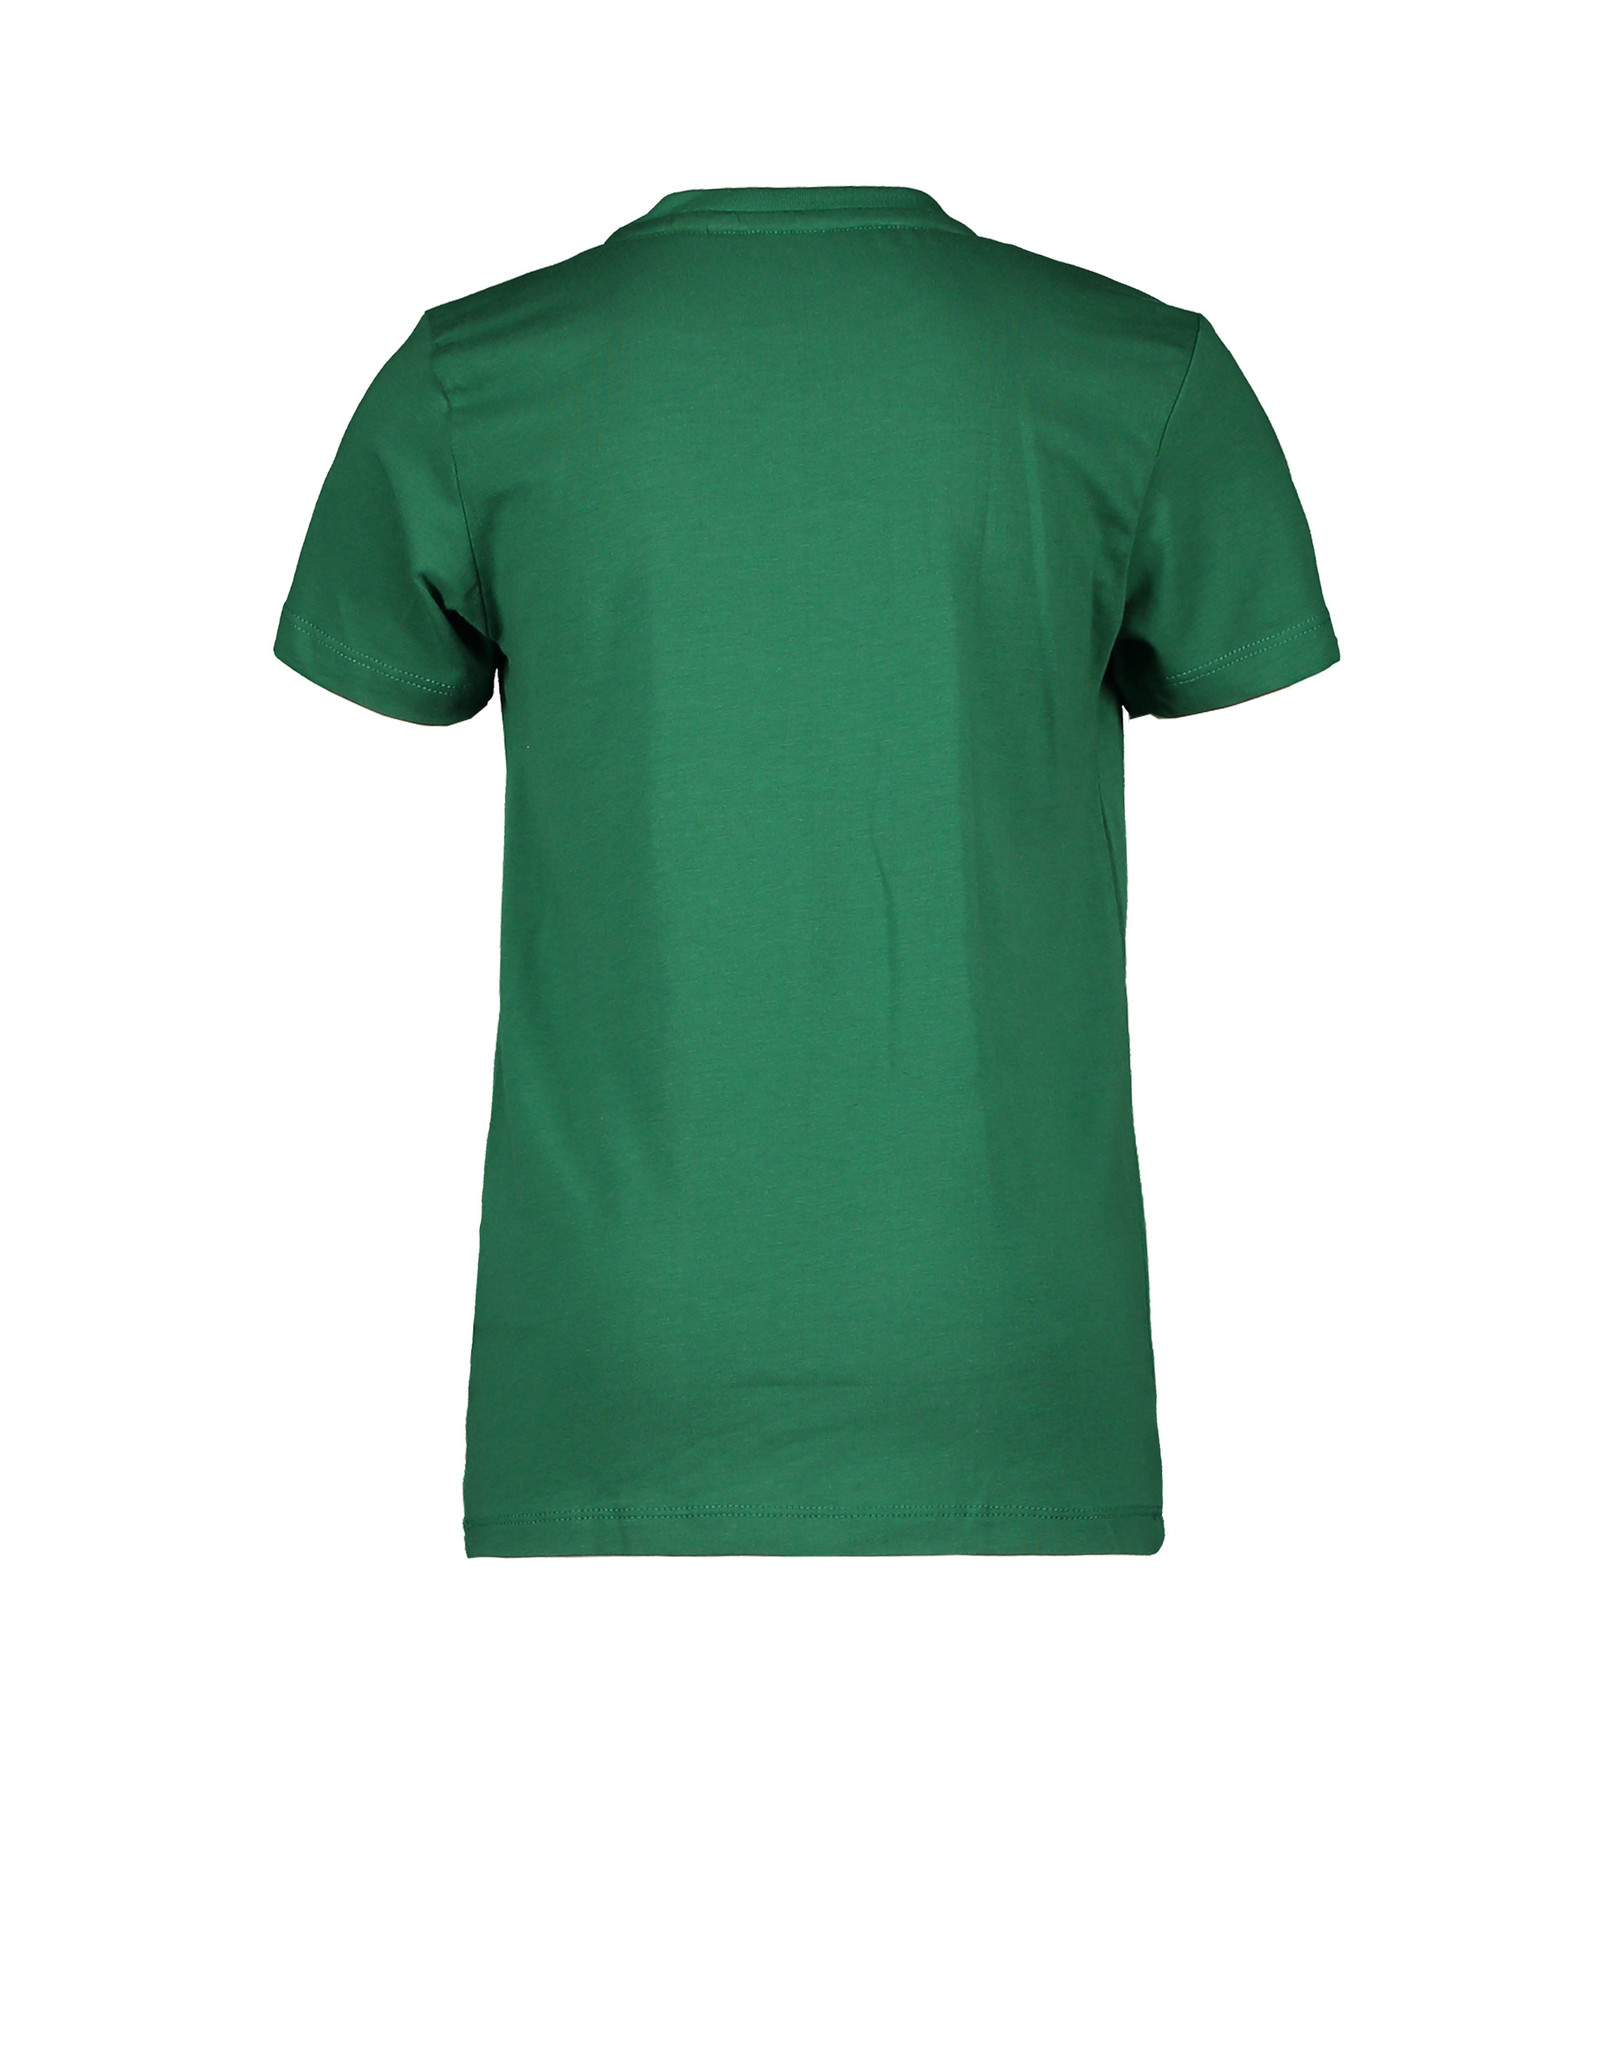 Moodstreet MT t-shirt print, Green